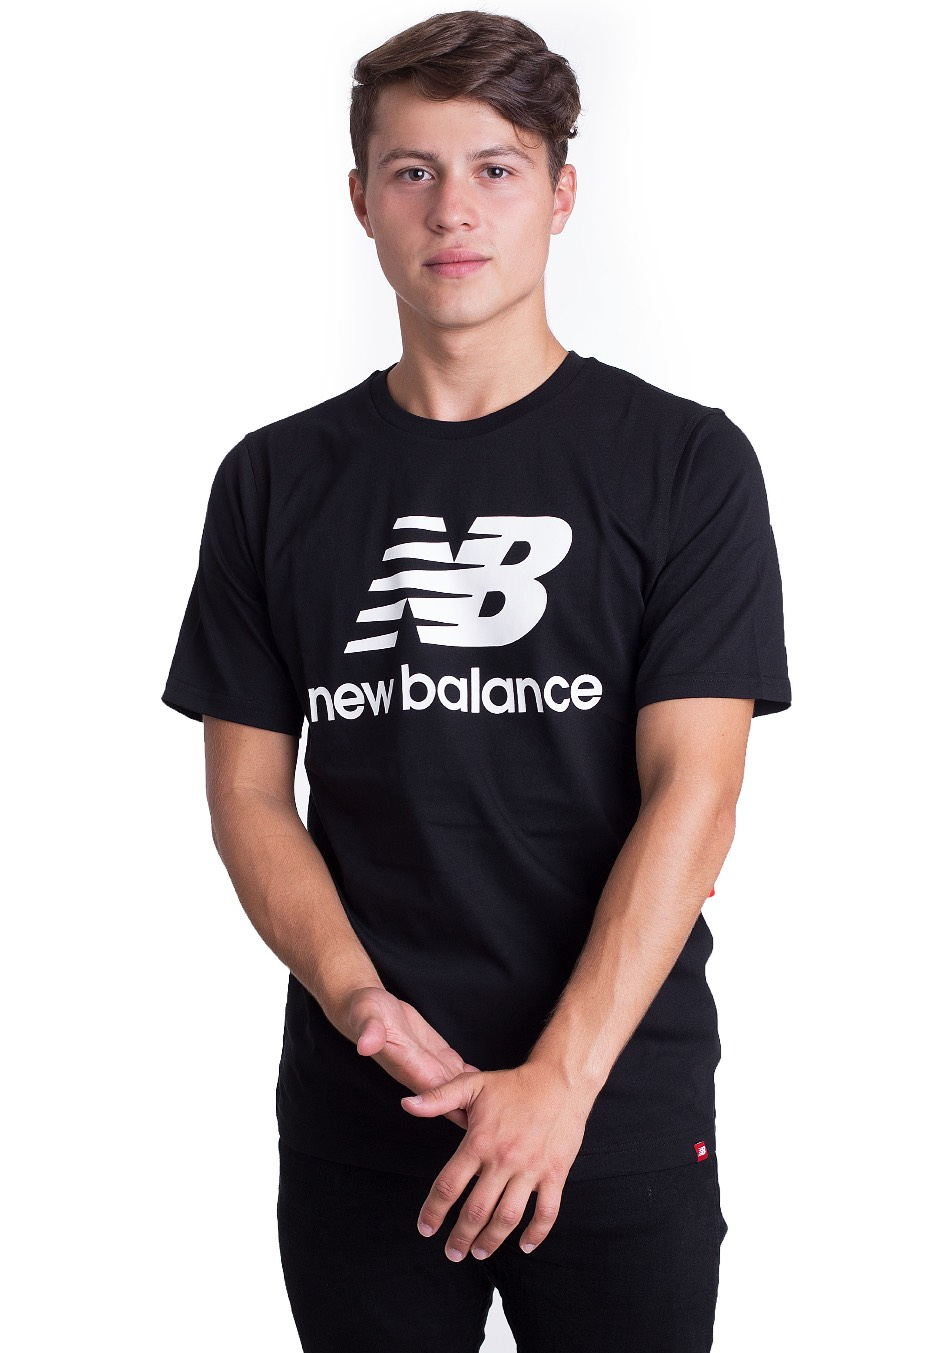 New Balance - MT83530 Black - T-Shirt - Impericon.com US